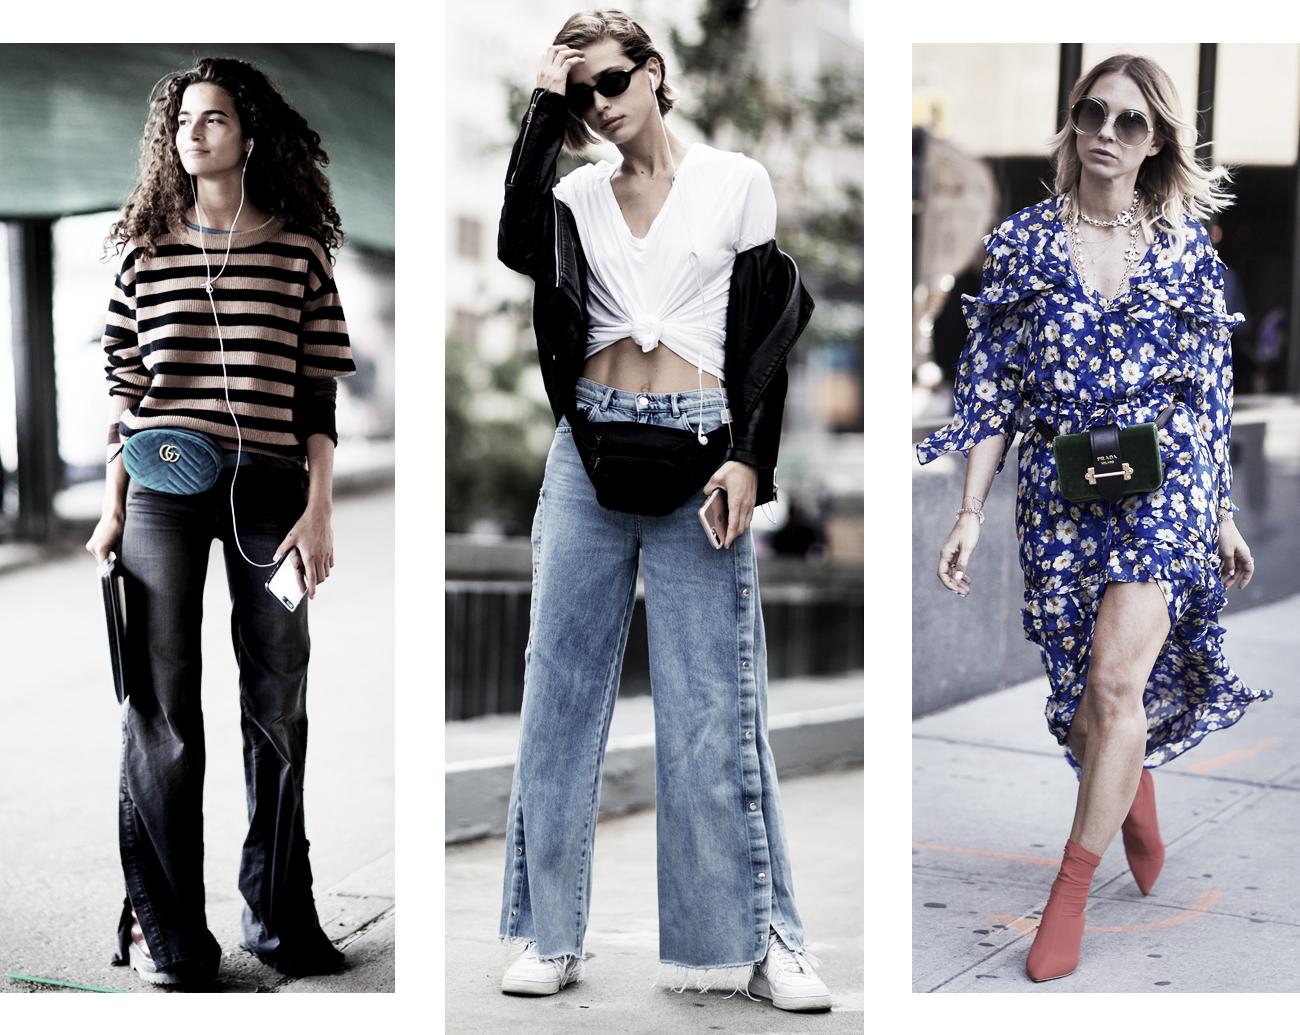 DISTRICT F - NEW YORK STREET STYLE SS18 belt bag trend